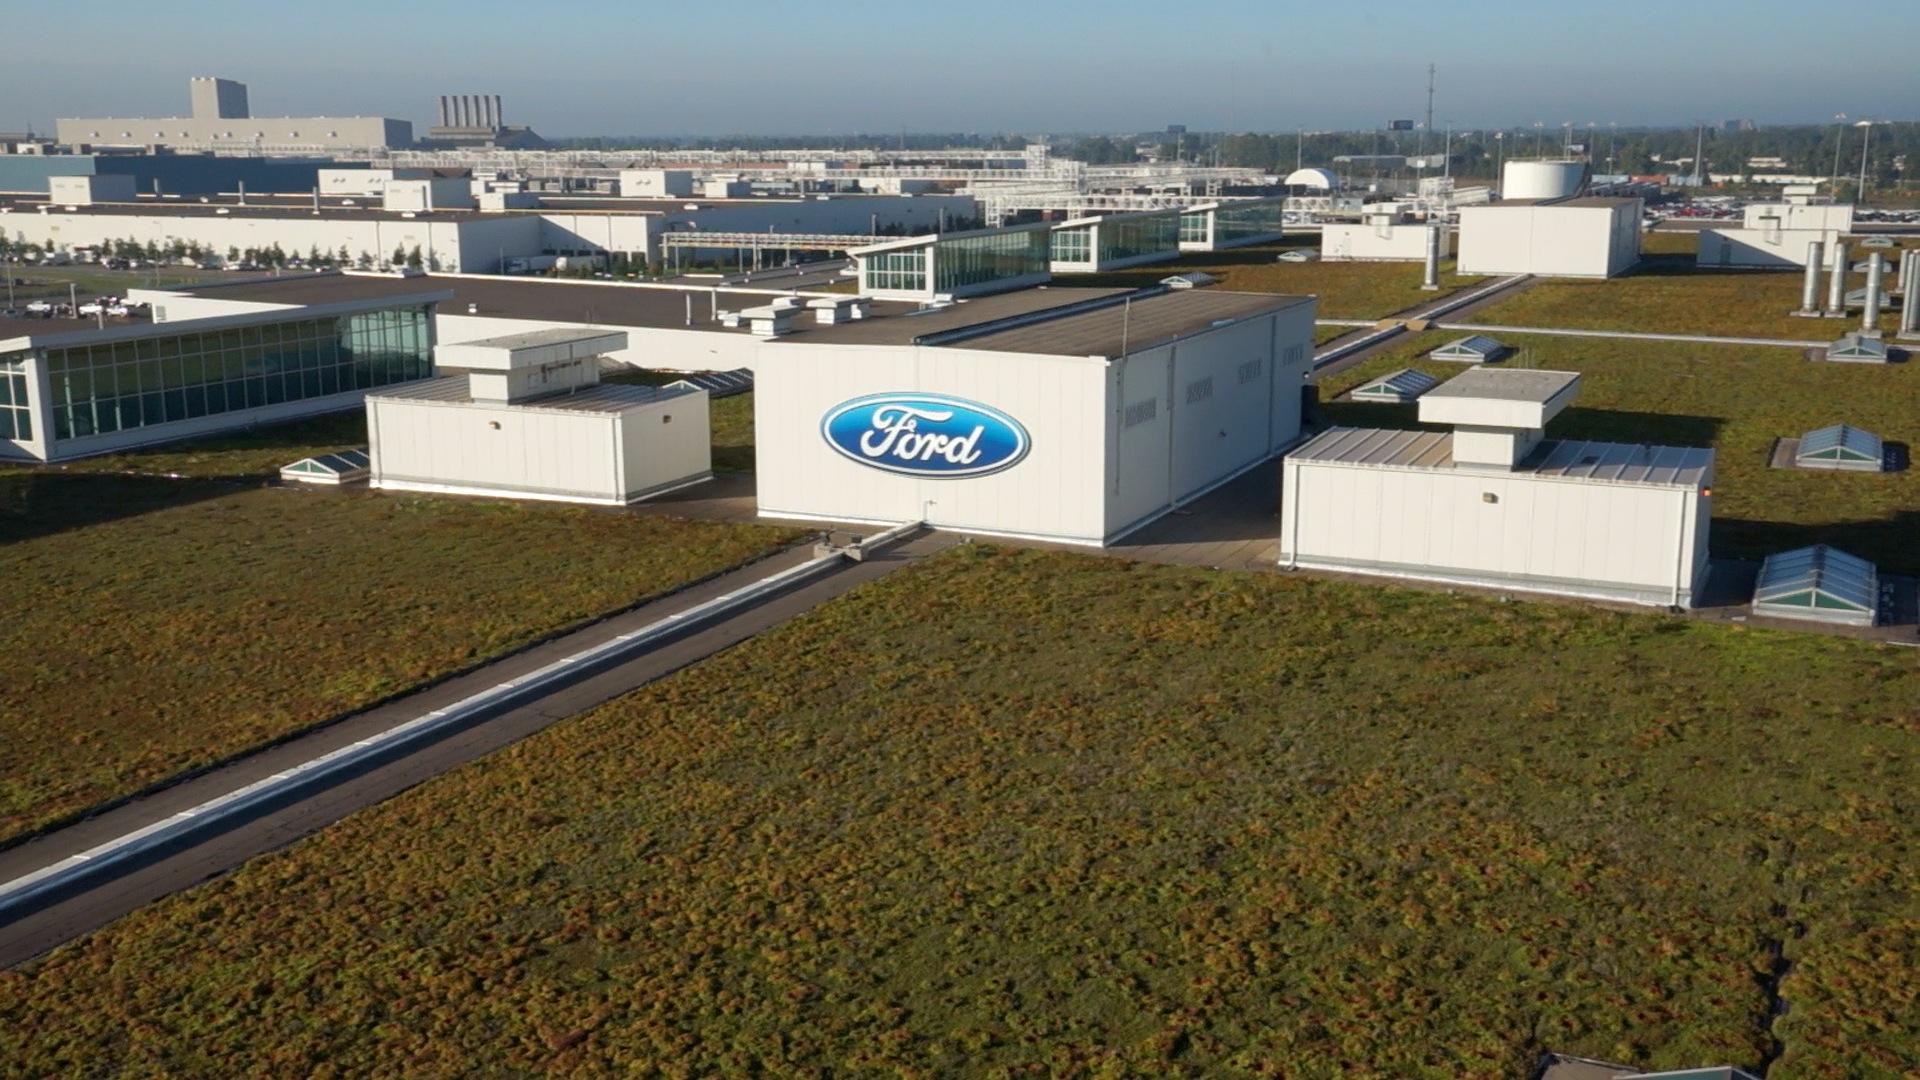 Dearborn Truck Plant